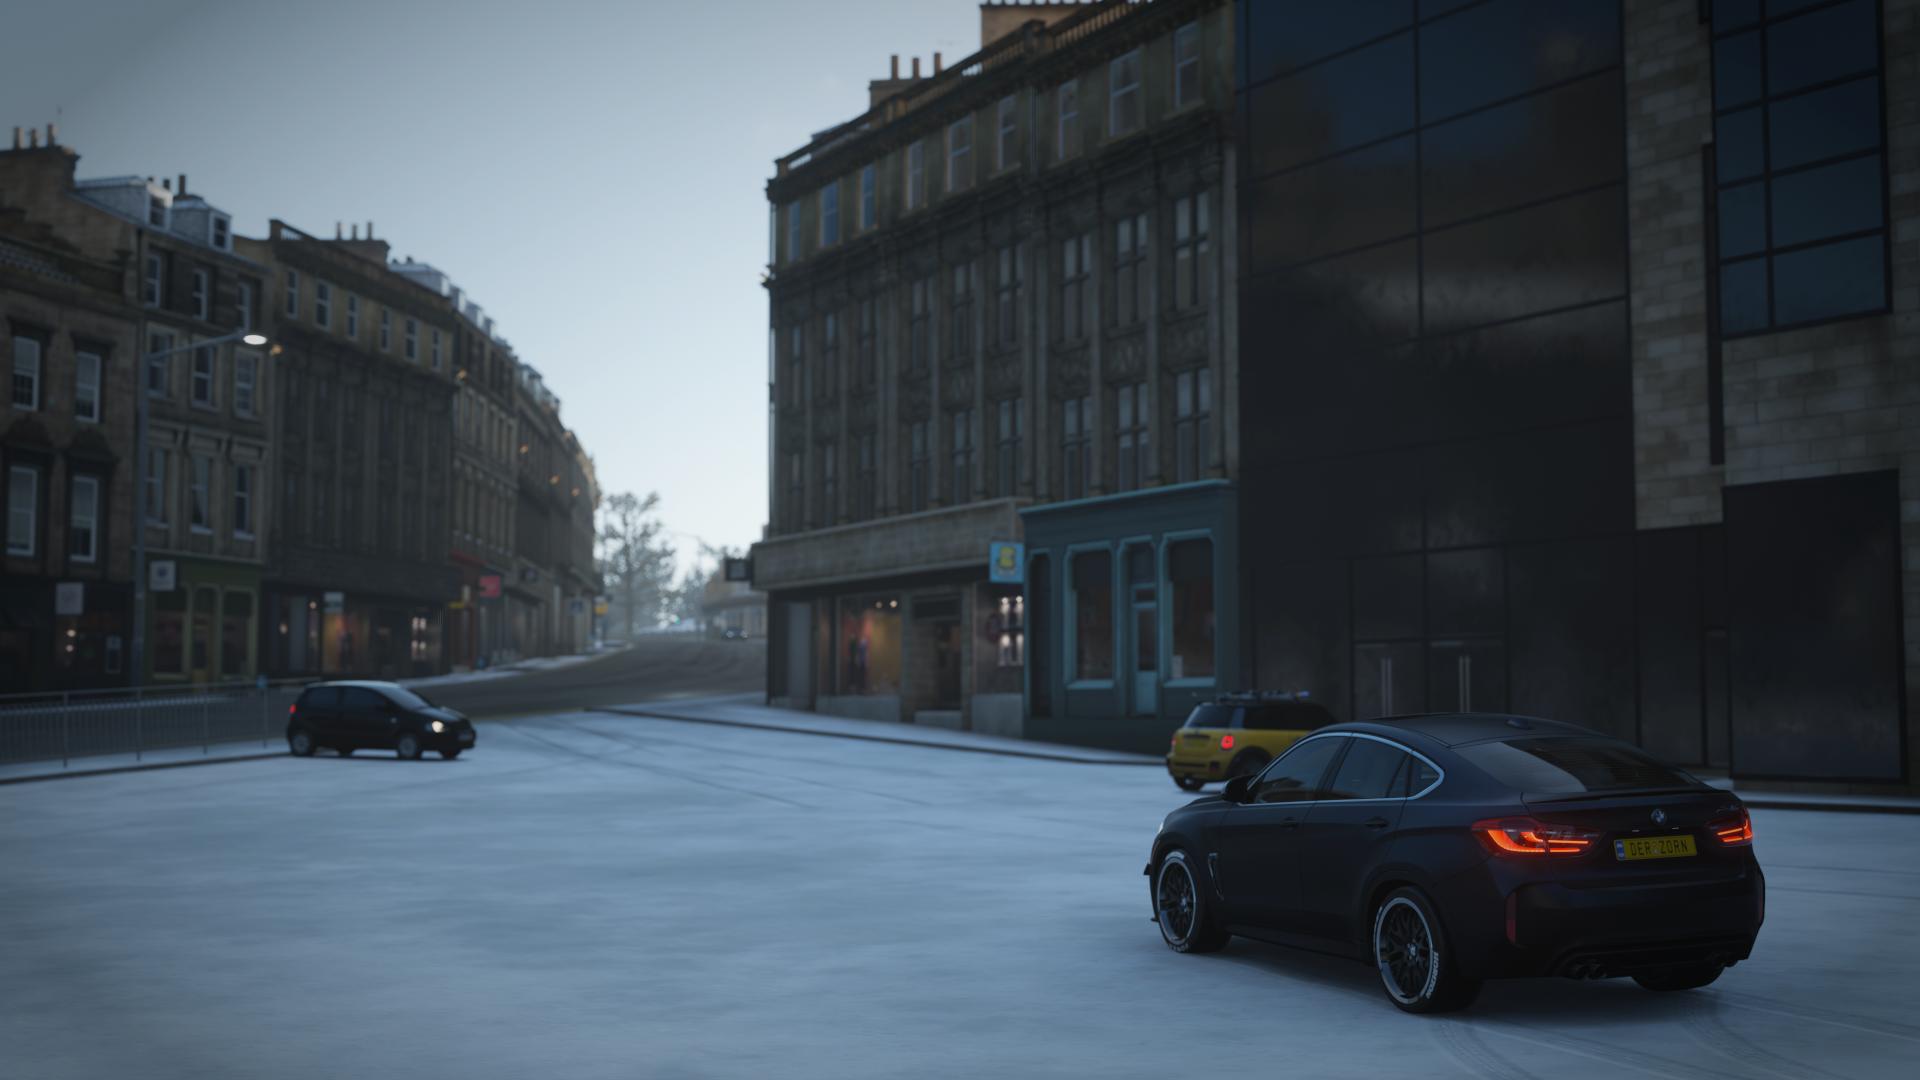 Fondos De Pantalla Bmw Bmw X6m Forza Horizon 4 Coche